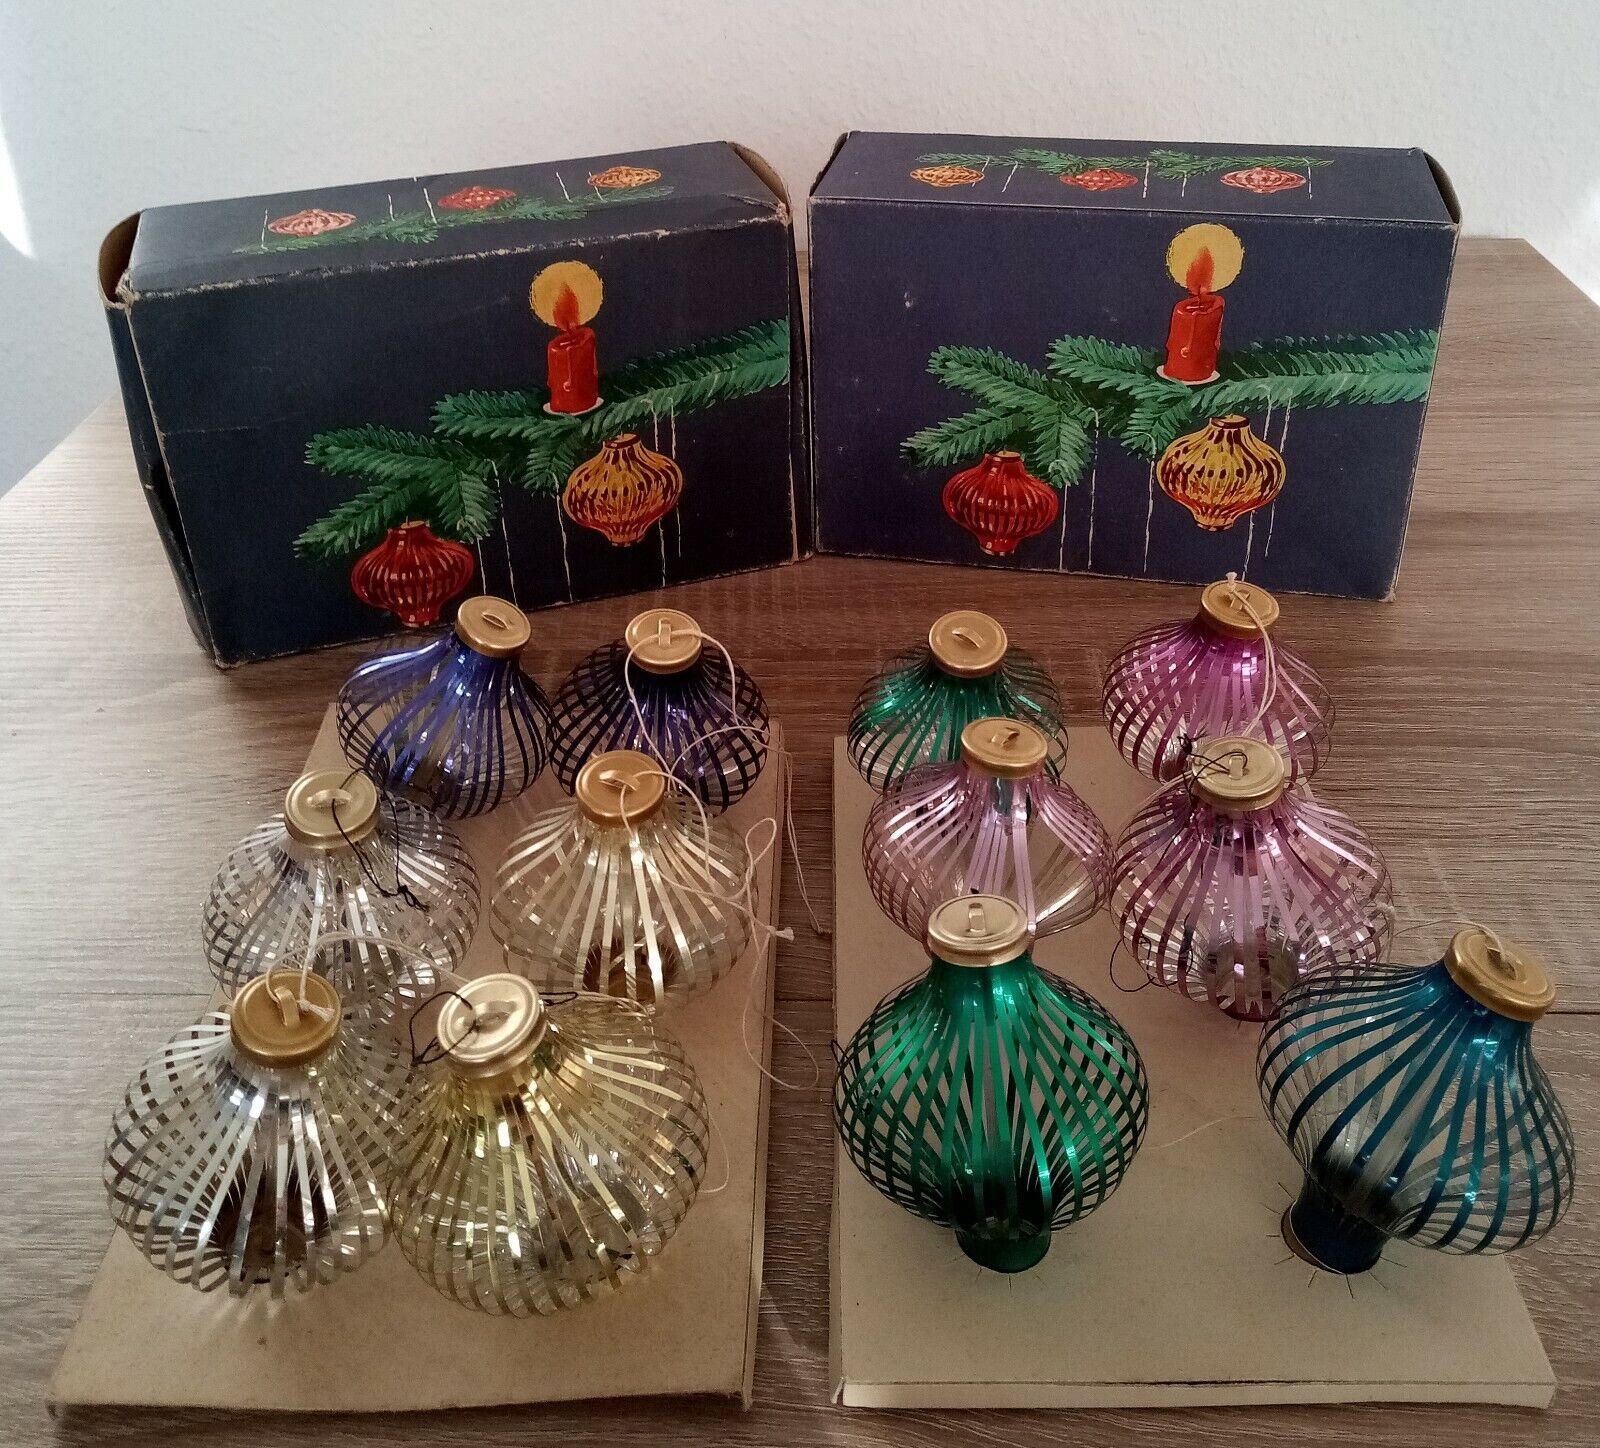 Weihnachtskugel, Christbaumkugeln VEB Thüringer Glasschmuck Lauscha DDR